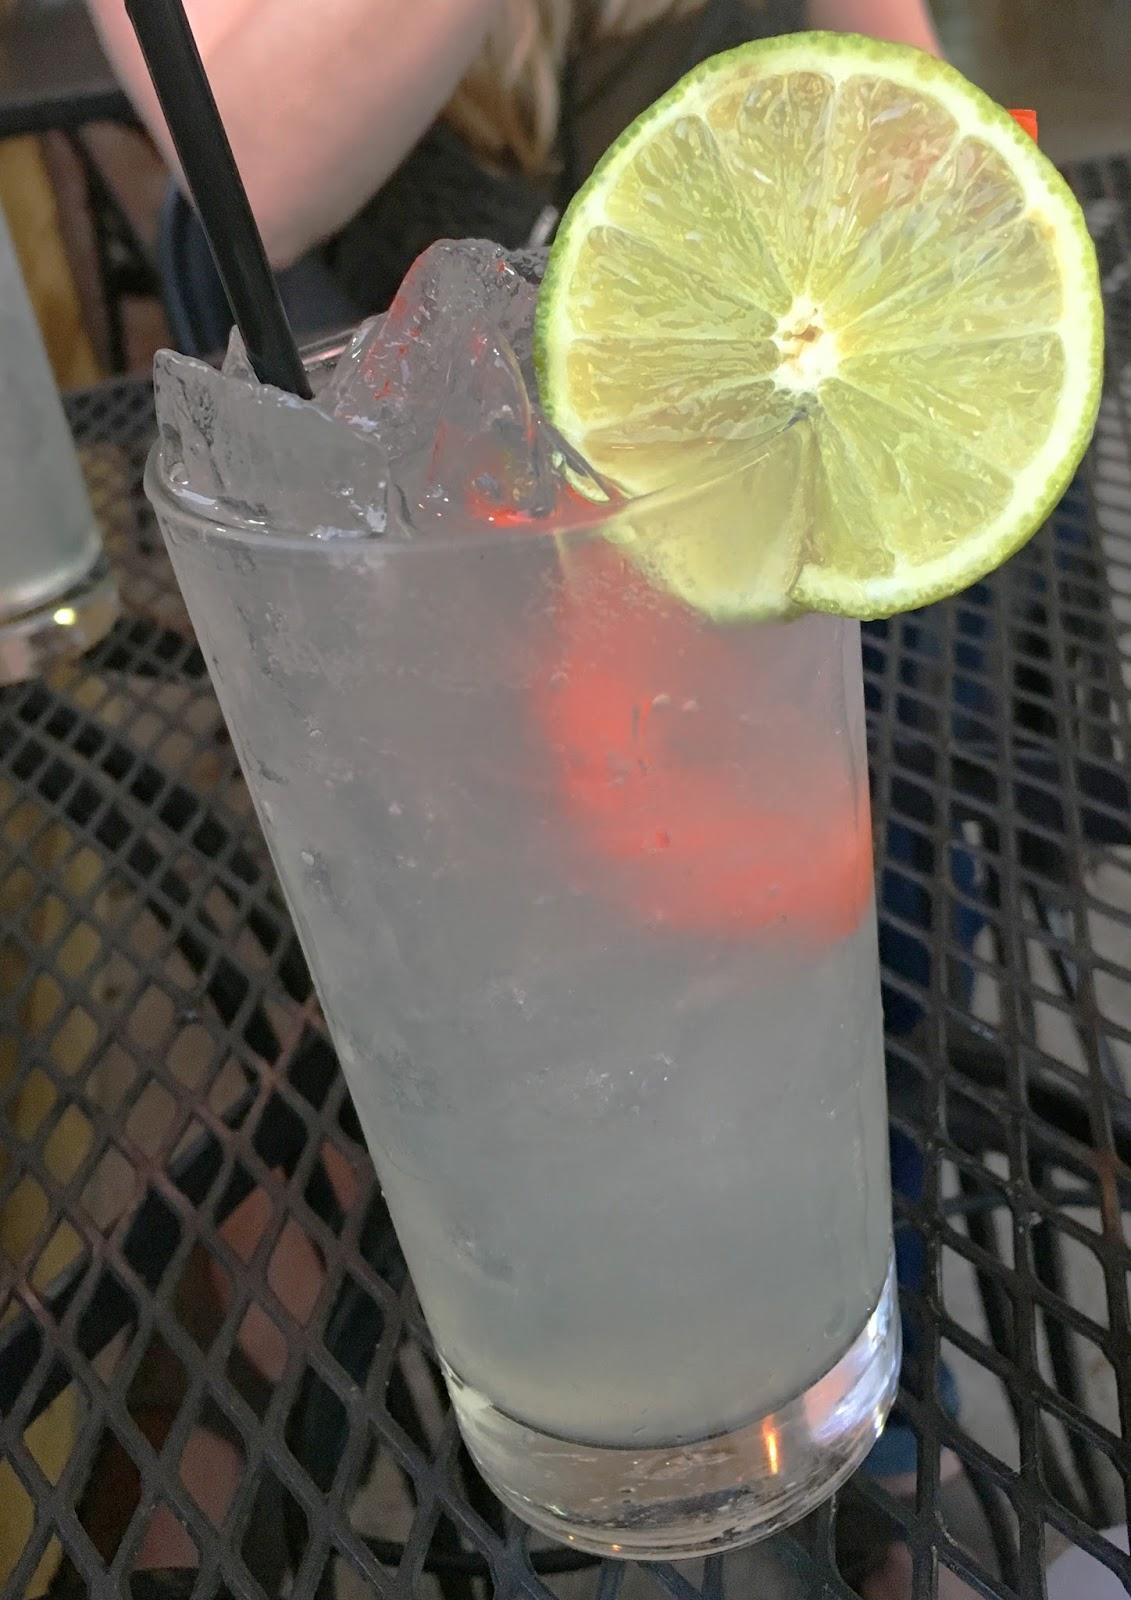 soju cocktail at Republic Diner + Sojubang, a Korean restaurant in Houston, Texas